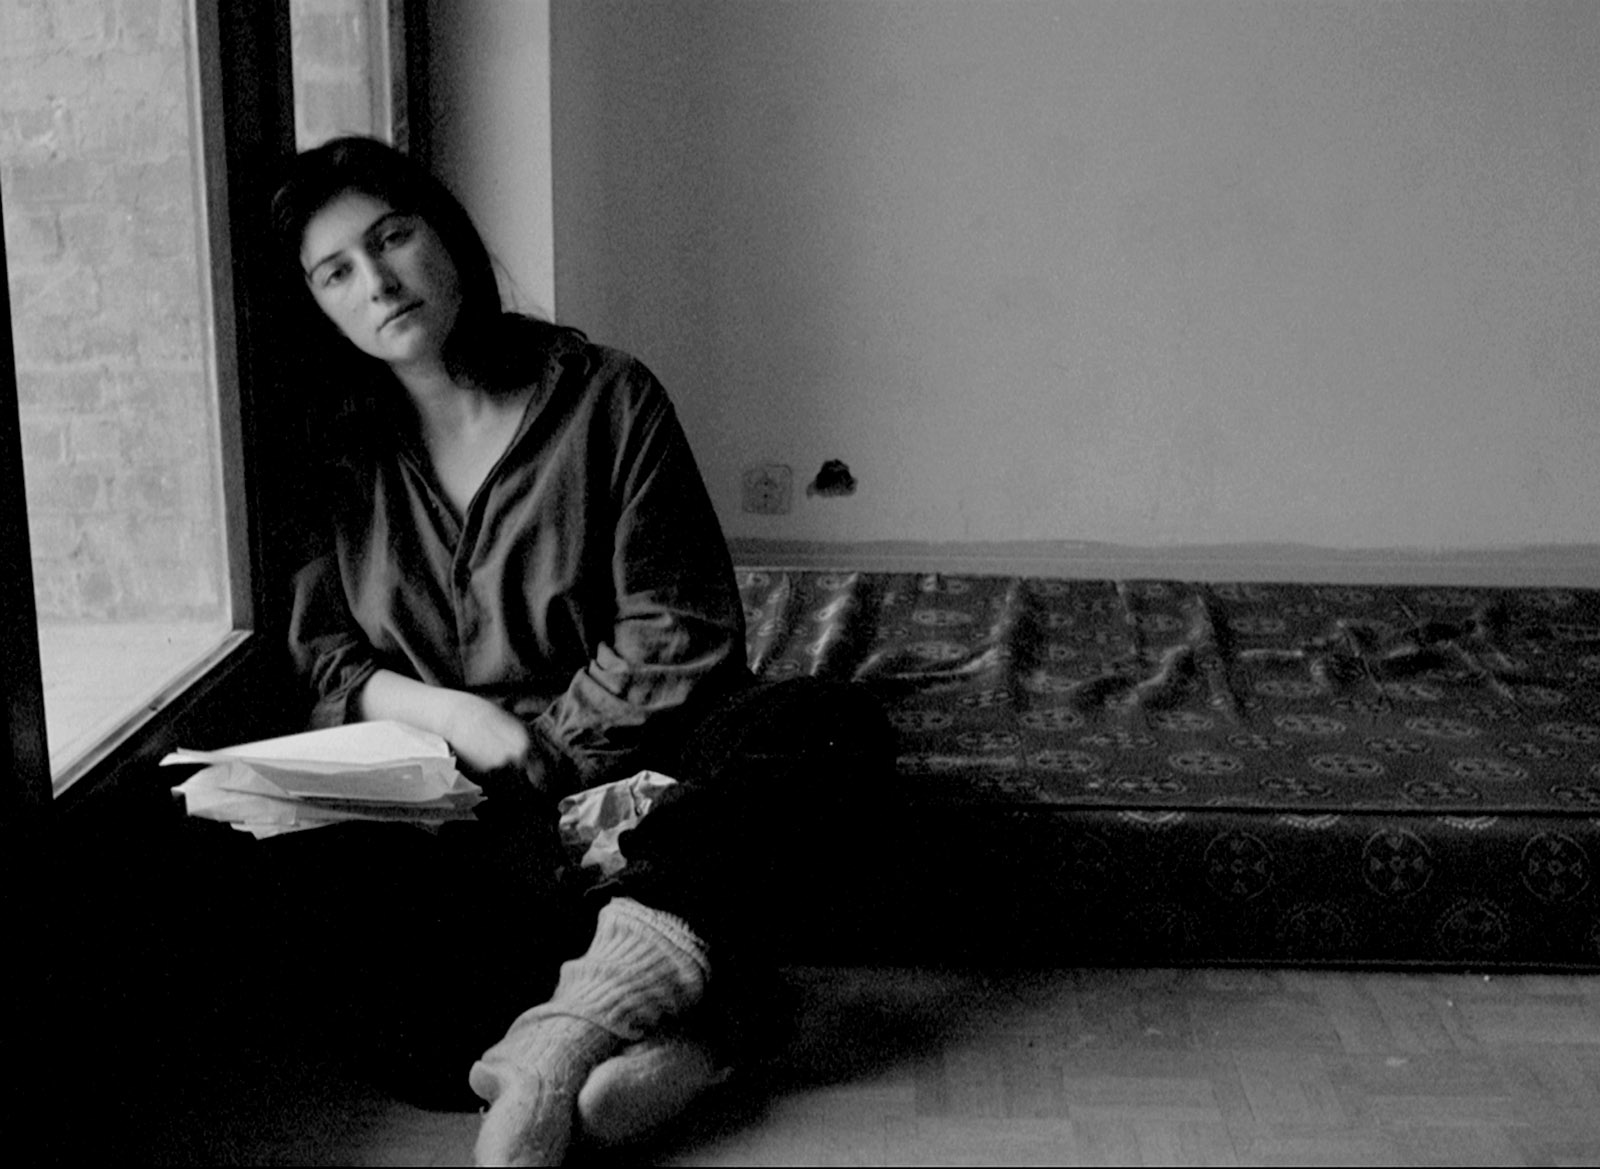 Chantal Akerman in her film Je tu il elle, 1974